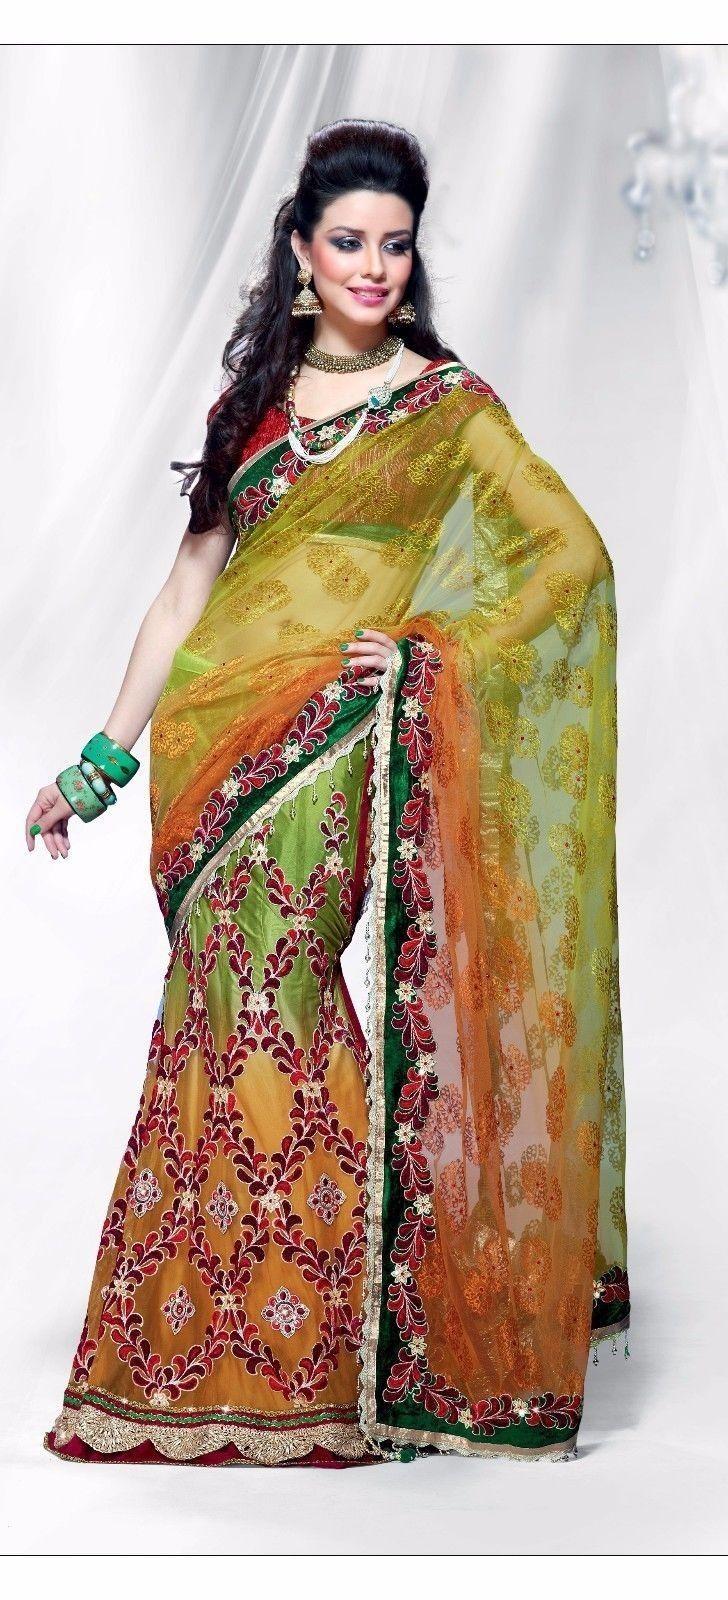 Cool Awesome Sari Lehenga Partywear Indian Ethnic Pakistani Saree Wedding Dress8034  2017/2018 Check more at http://shop24.ga/fashion/awesome-sari-lehenga-partywear-indian-ethnic-pakistani-saree-wedding-dress8034-20172018/